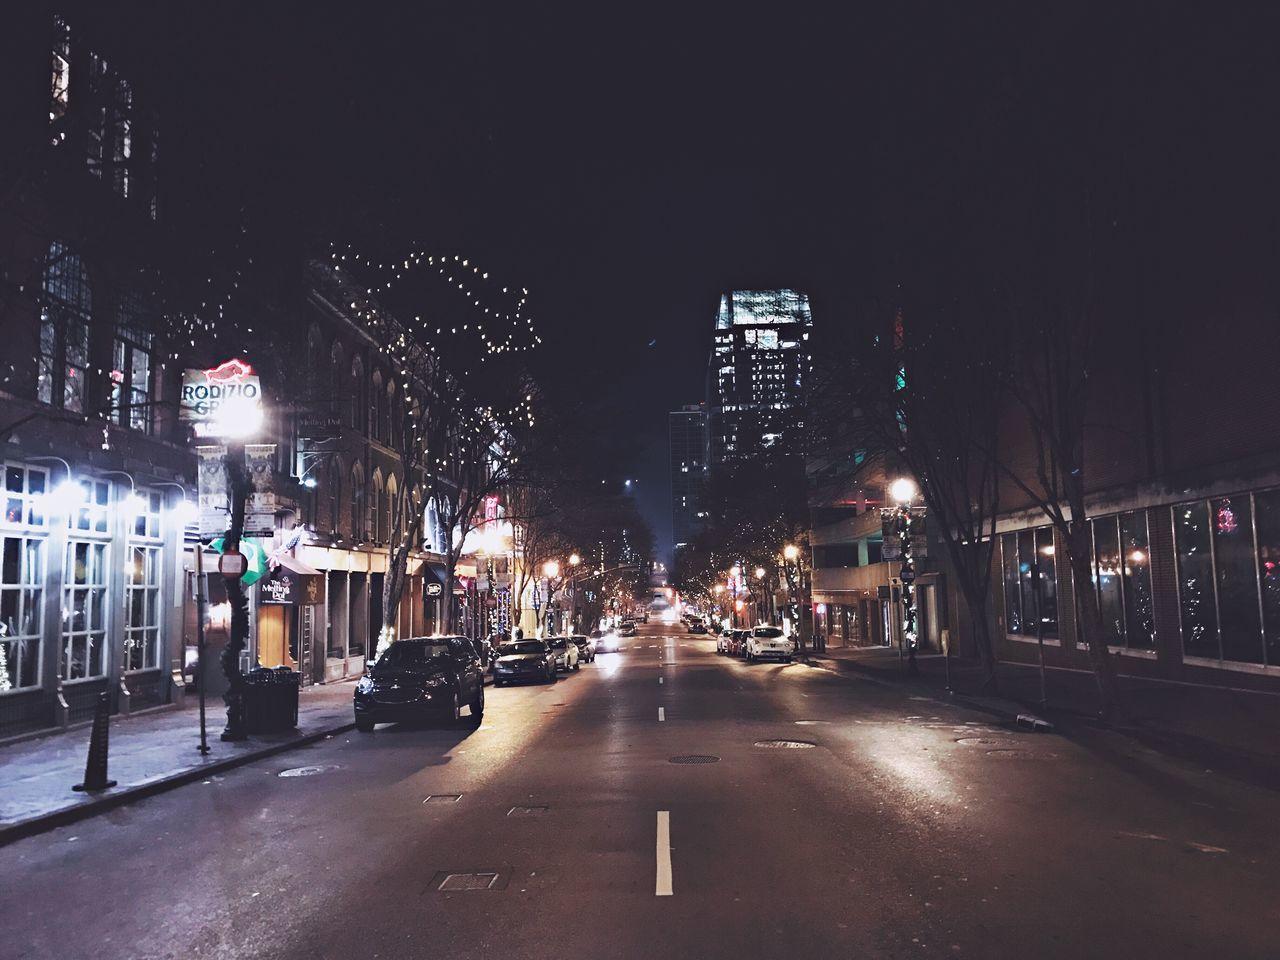 Illuminated City Night Building Exterior Street Road Outdoors Nightlife Nashville TN Nashville NASHVILLE,TENNESSEE